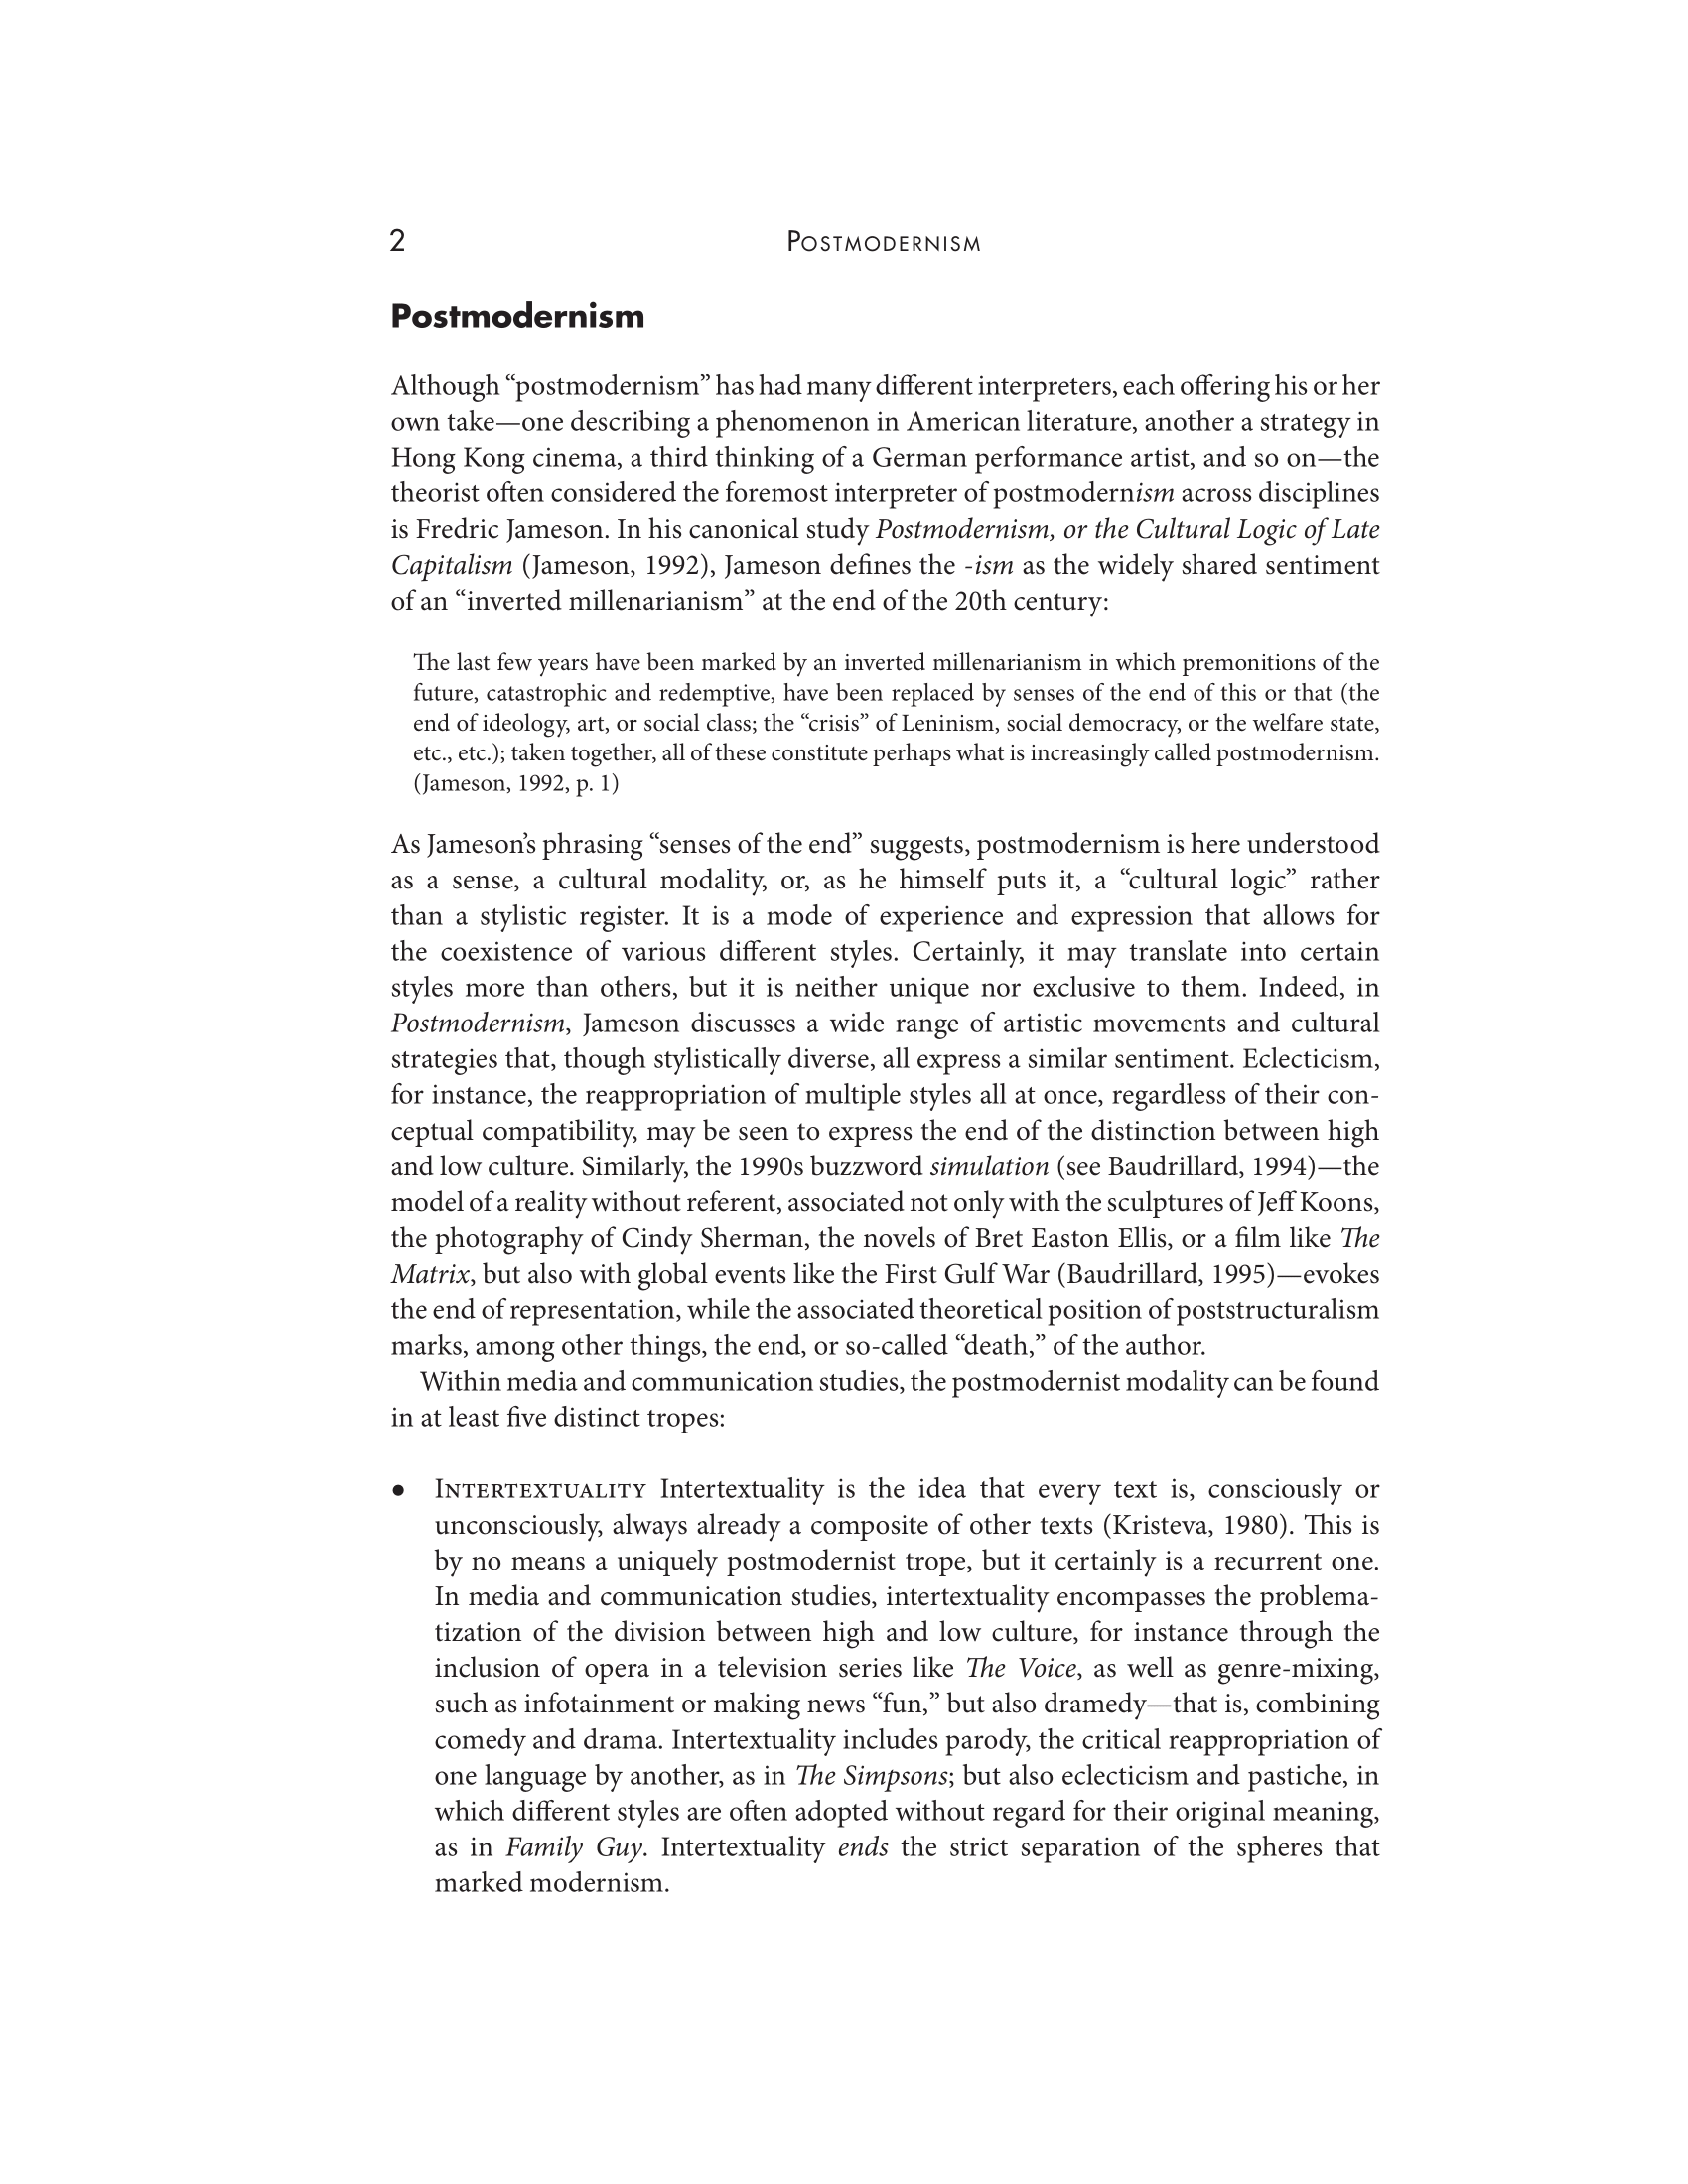 Postmodernism-2.png